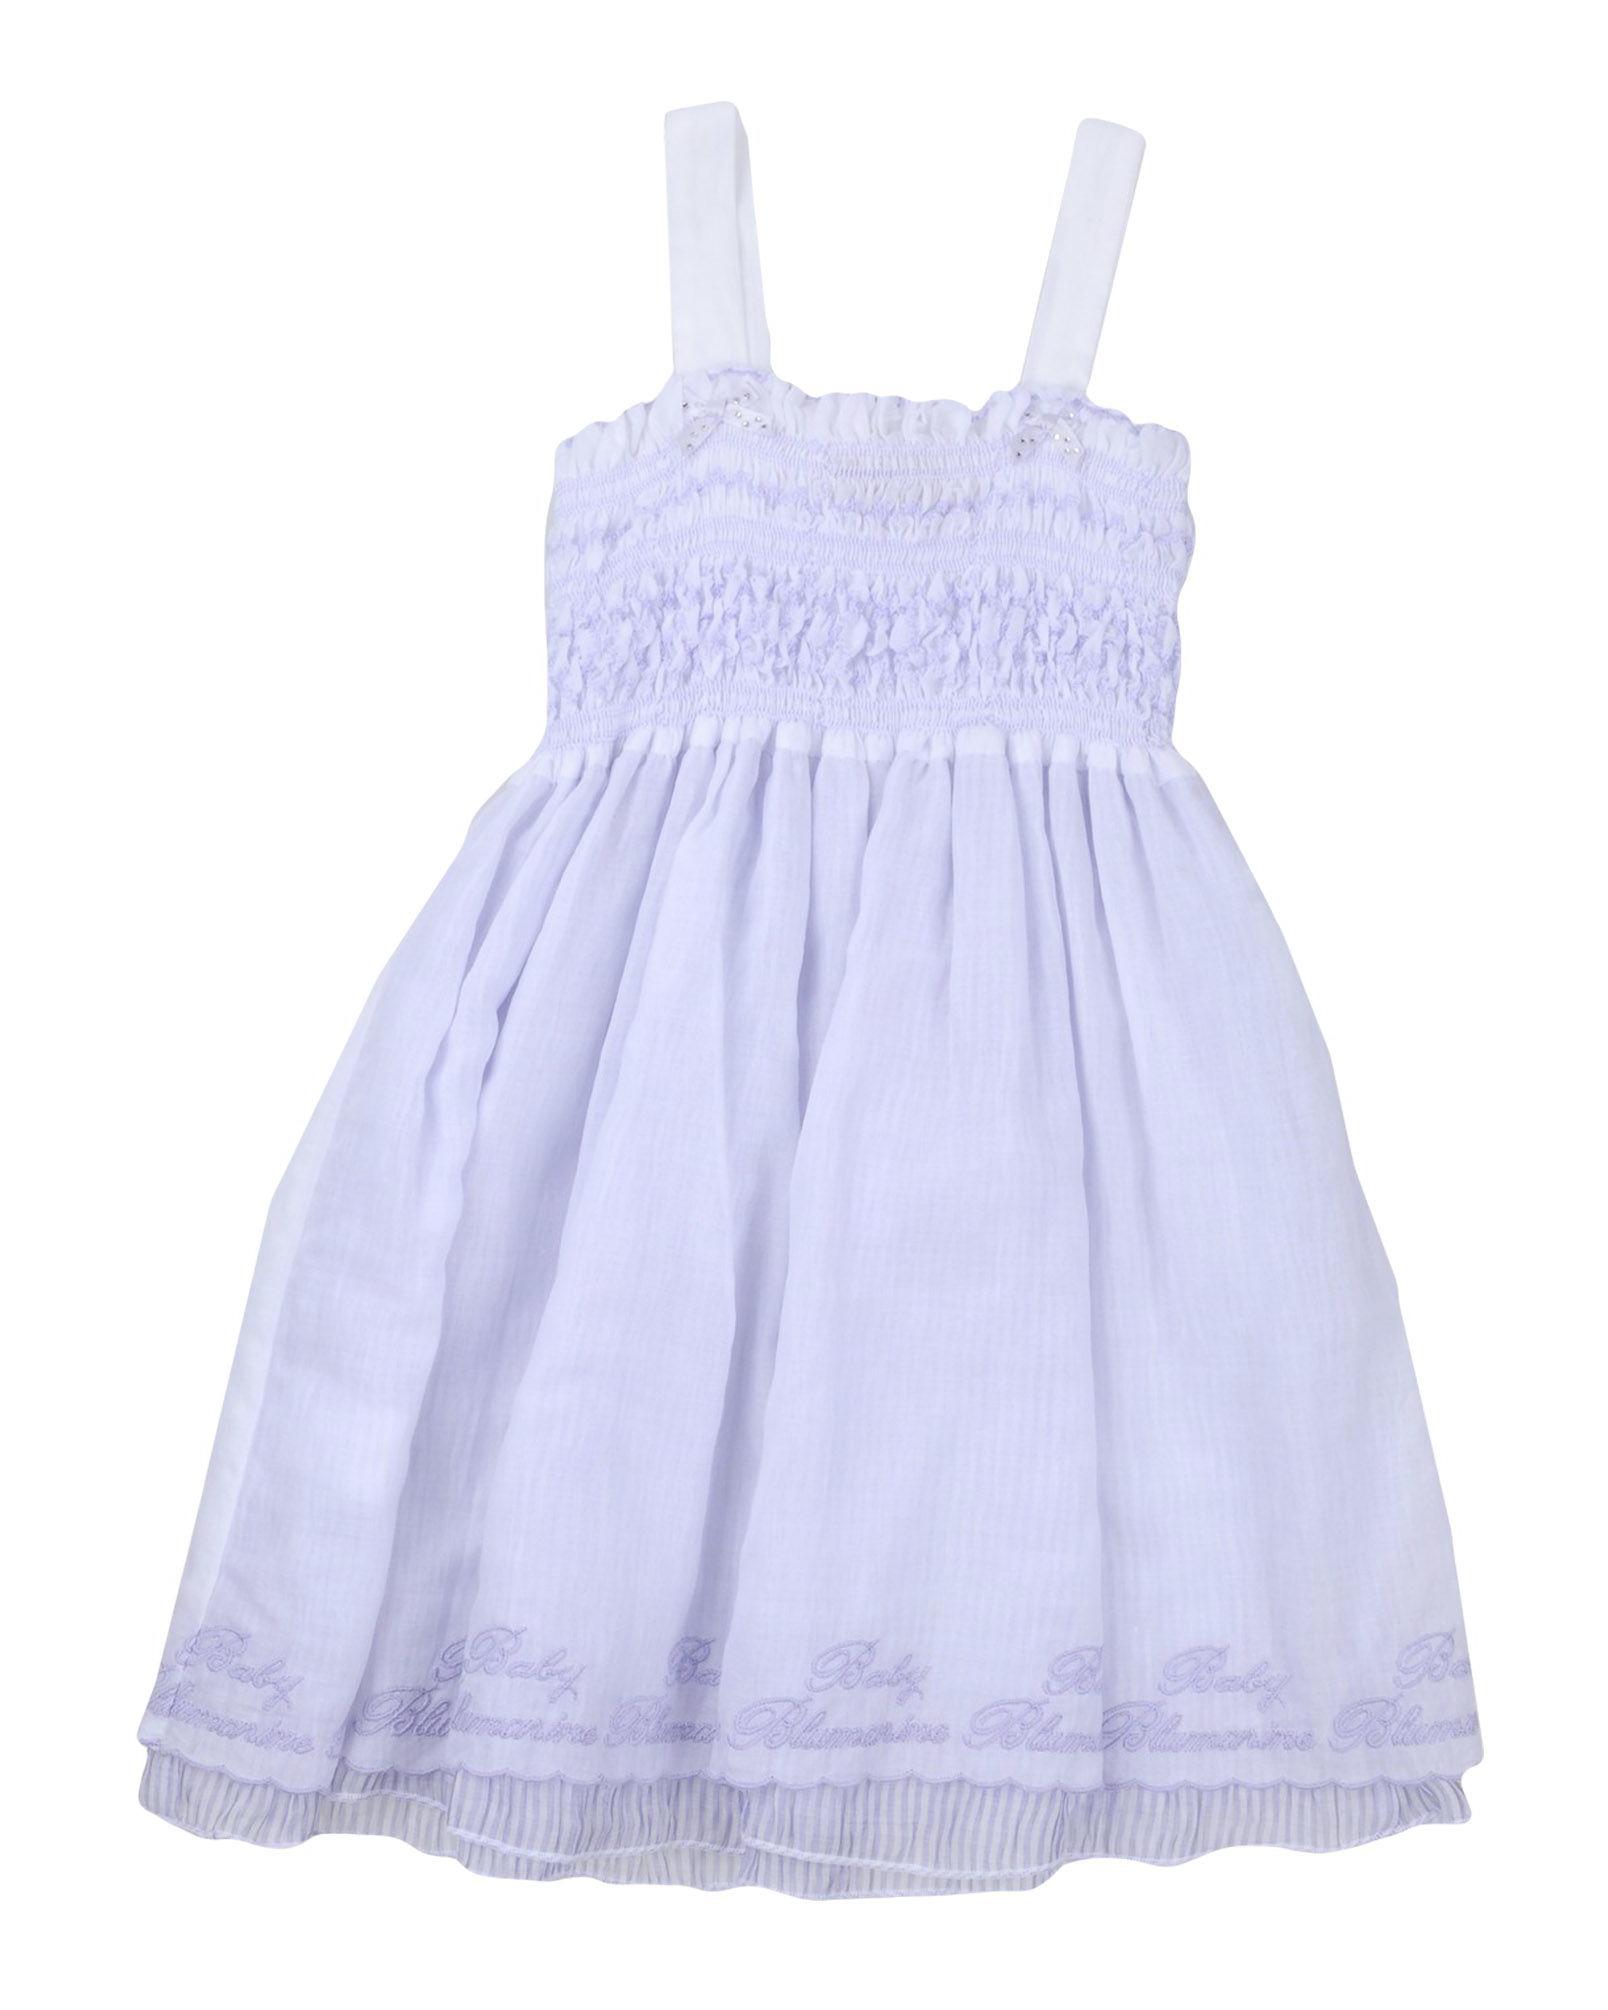 Miss Blumarine Cotton Dress